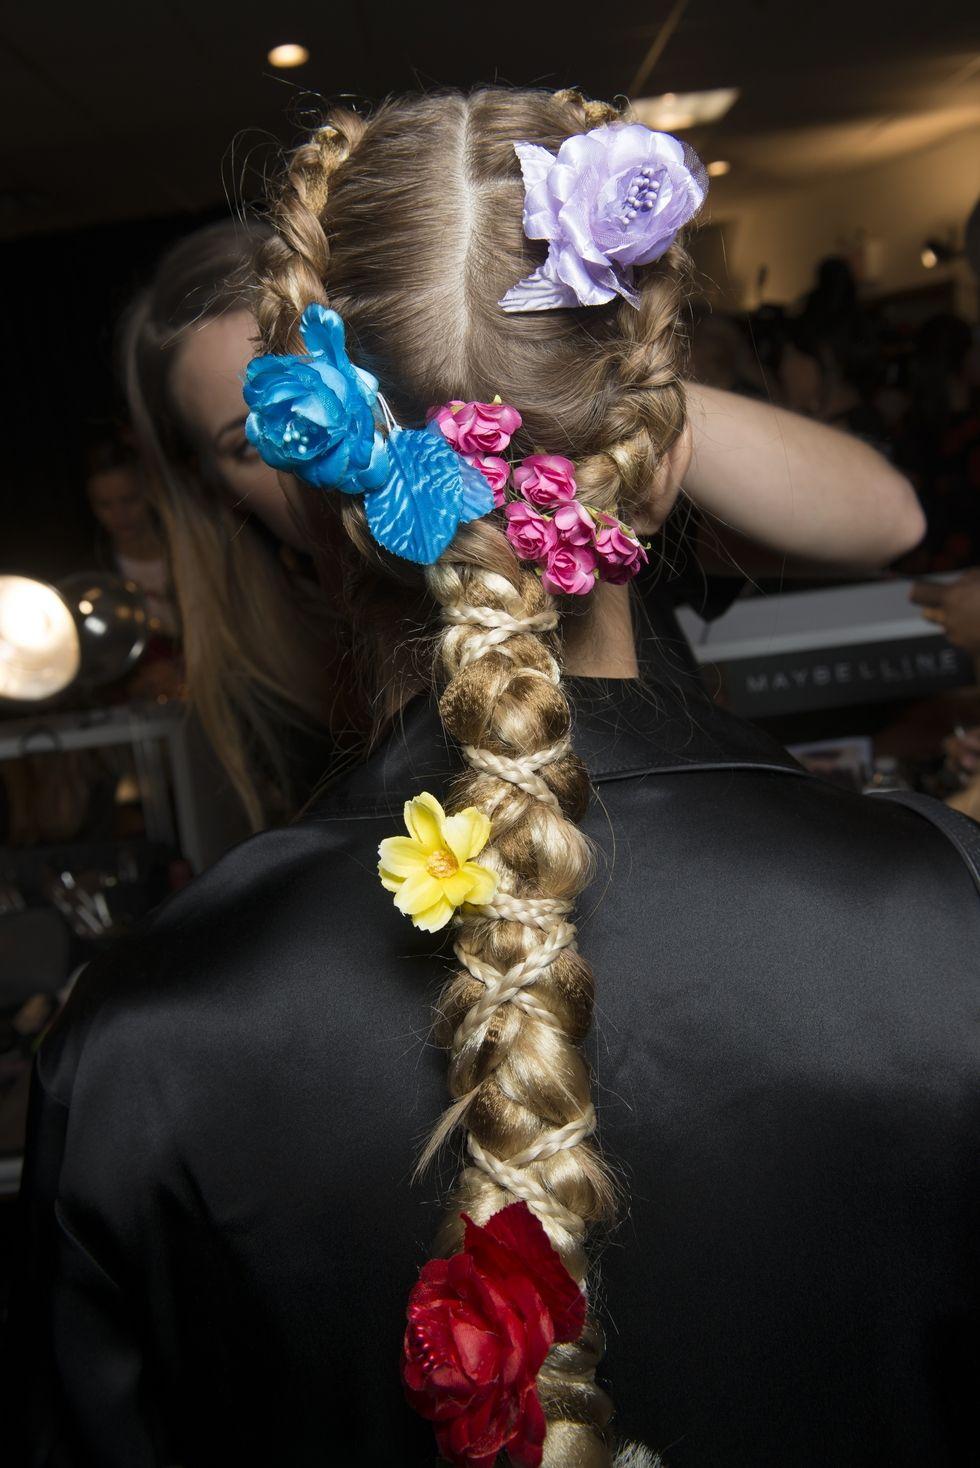 Peinados sencillos con accesorios tendencia 2018, flores